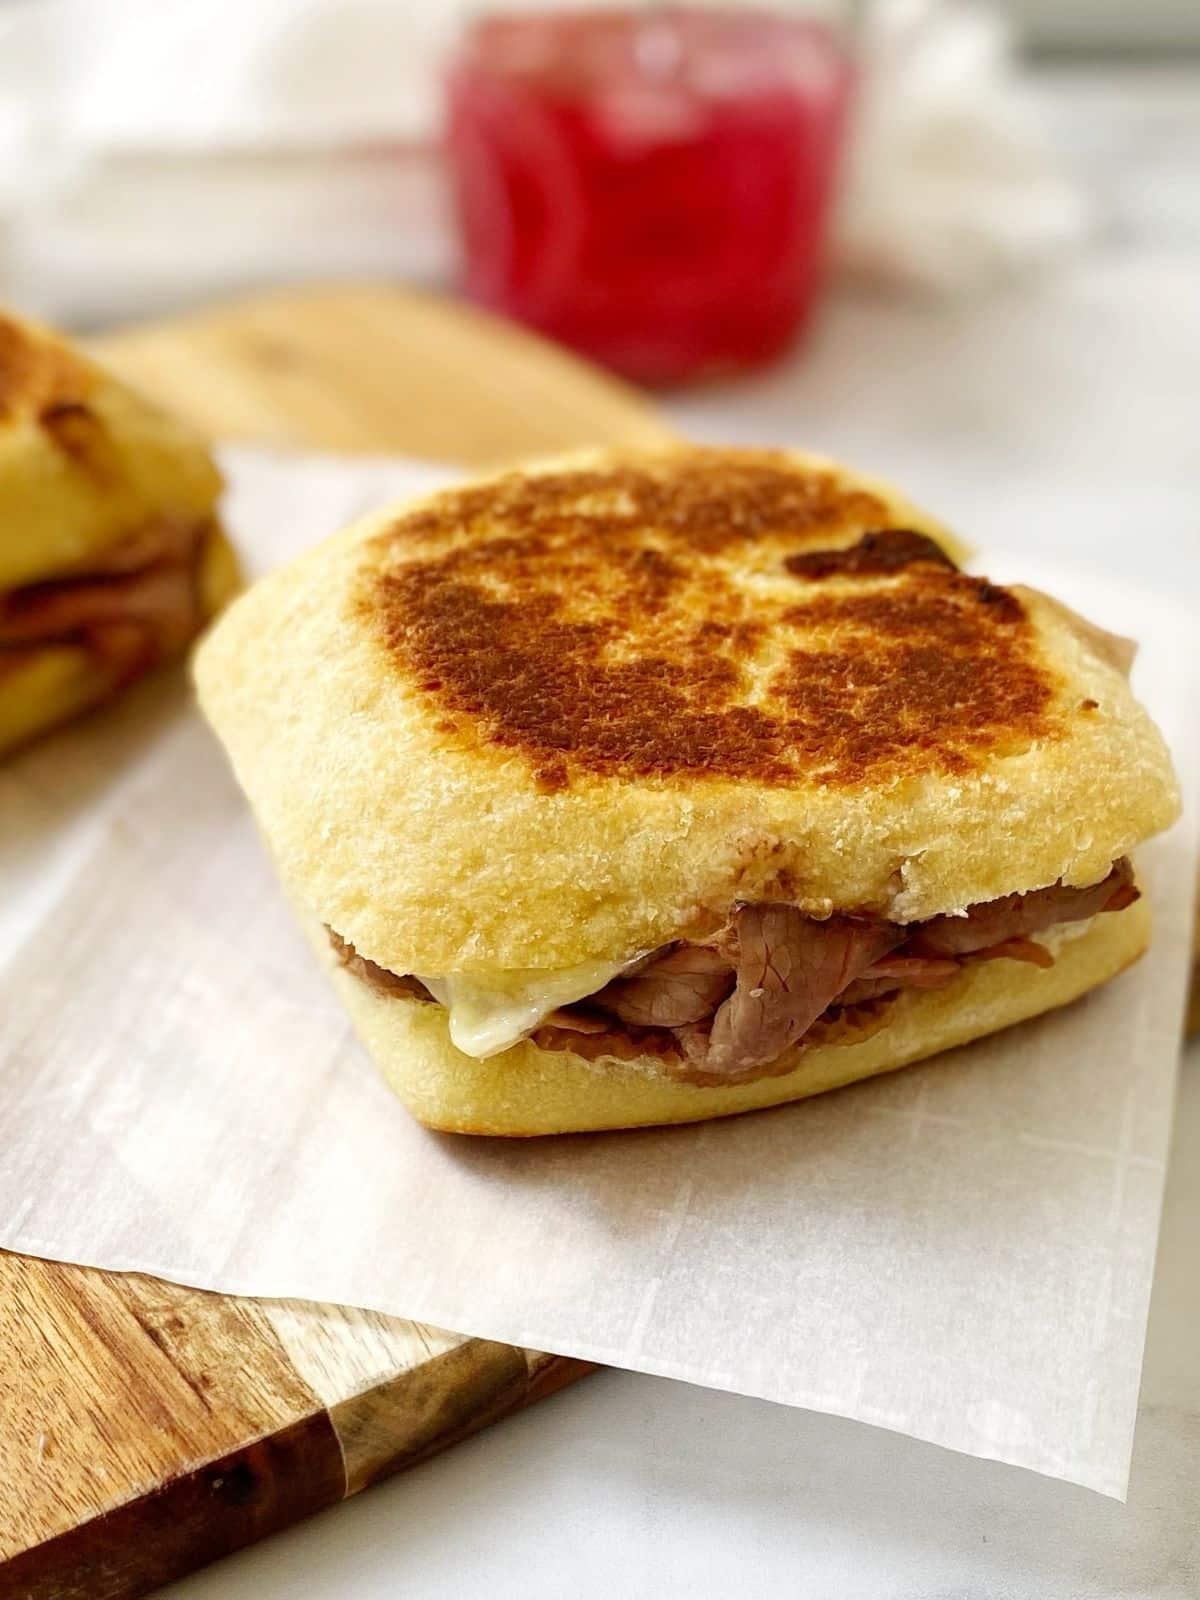 steak and white cheddar sandwich.